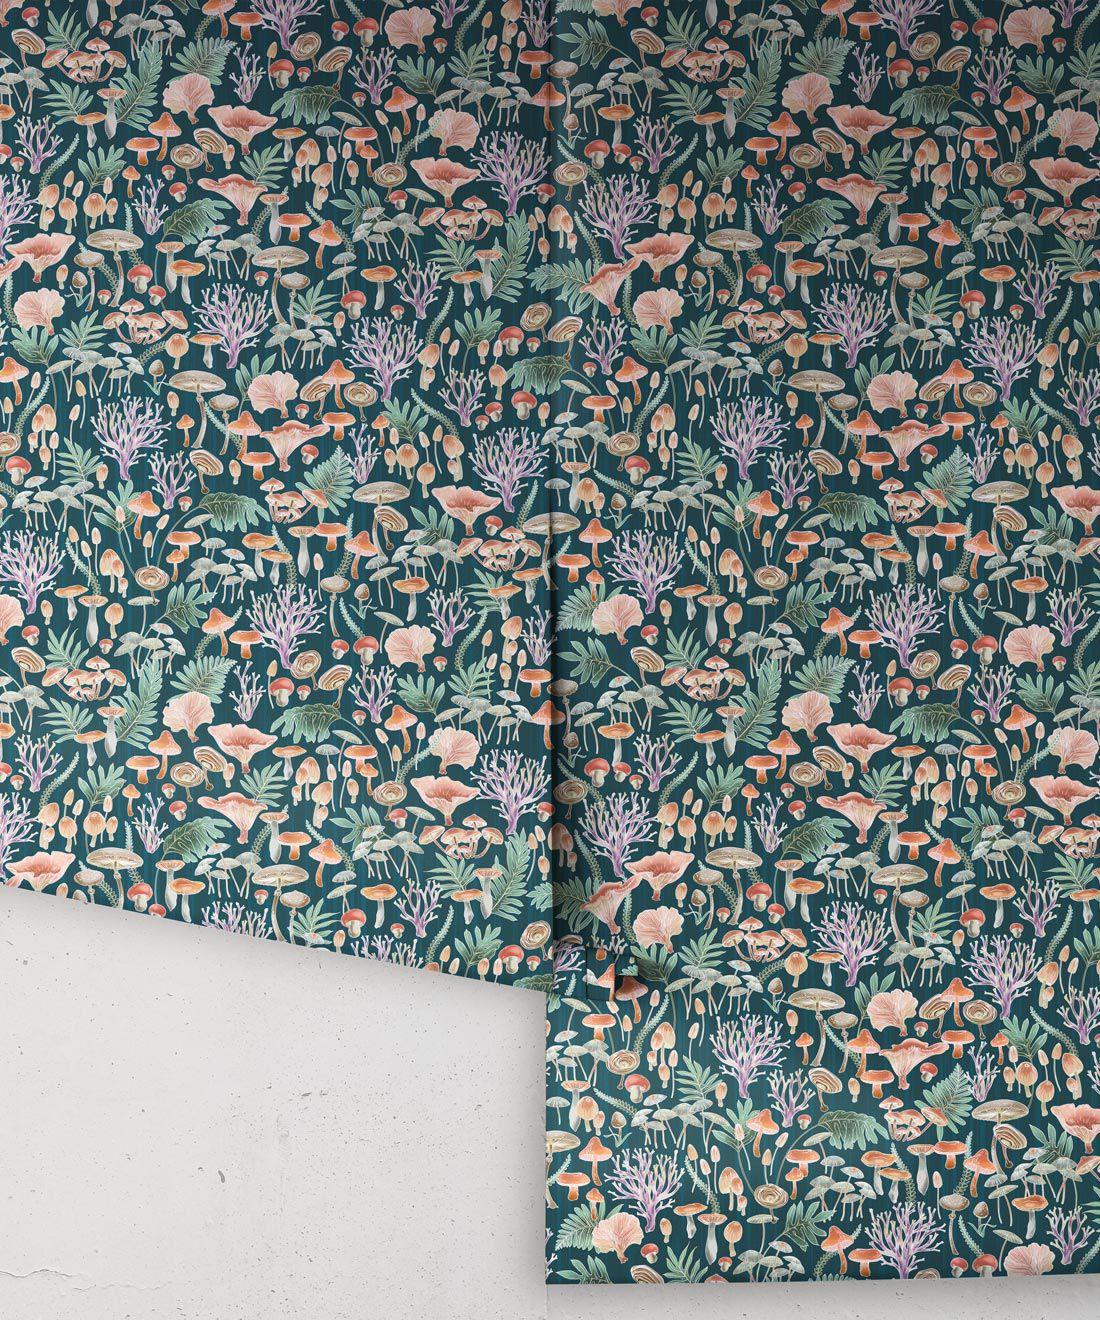 Fungi Wallpaper • Eloise Short • Vintage Floral Wallpaper •Granny Chic Wallpaper • Grandmillennial Style Wallpaper •Ocean •Rolls